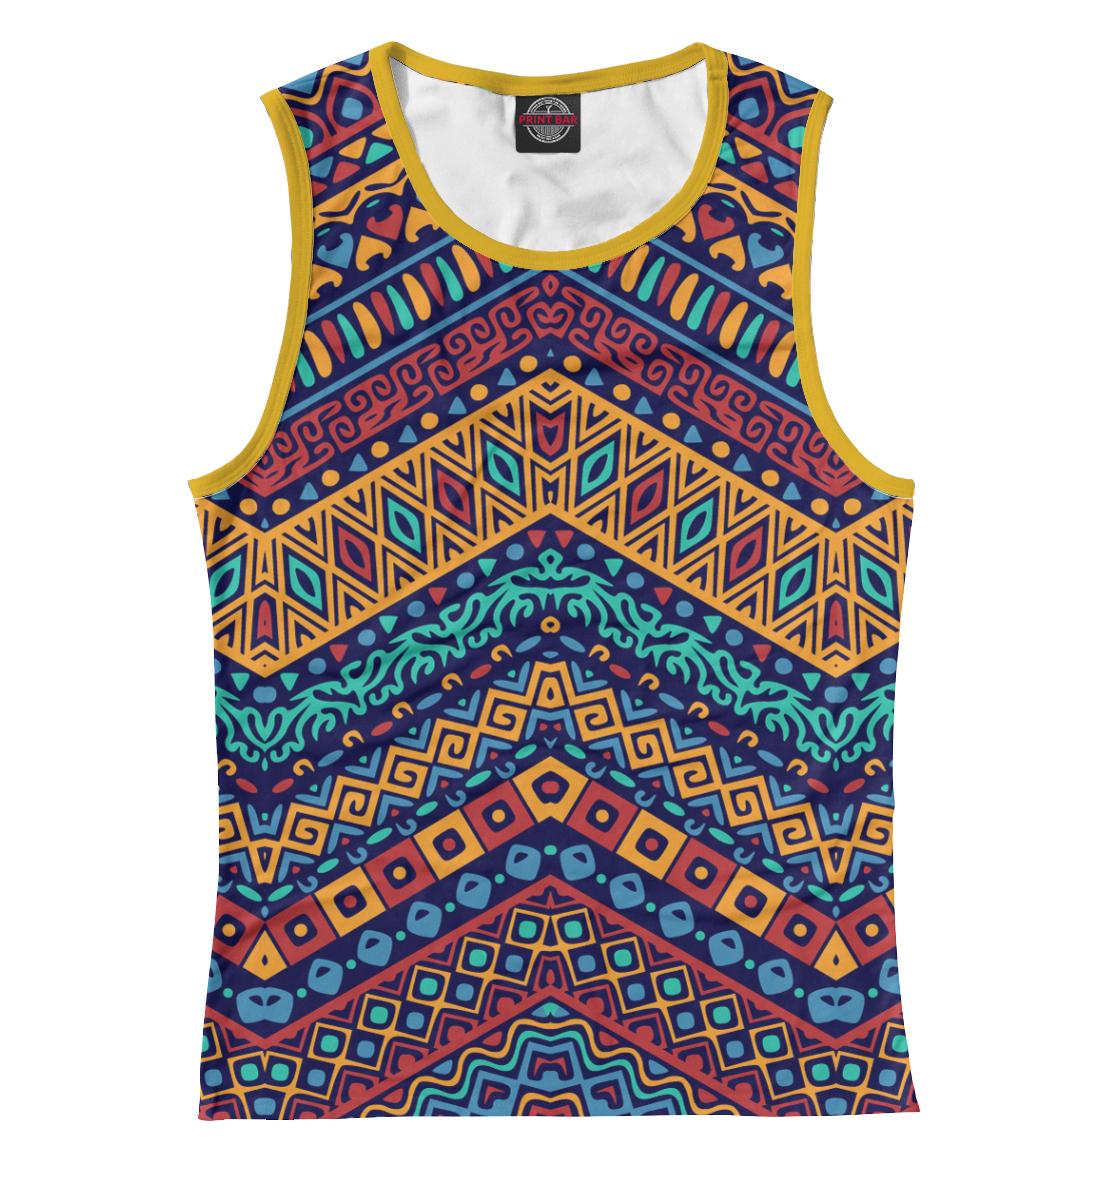 Купить Африканский мотив, Printbar, Майки, CTS-356305-may-1